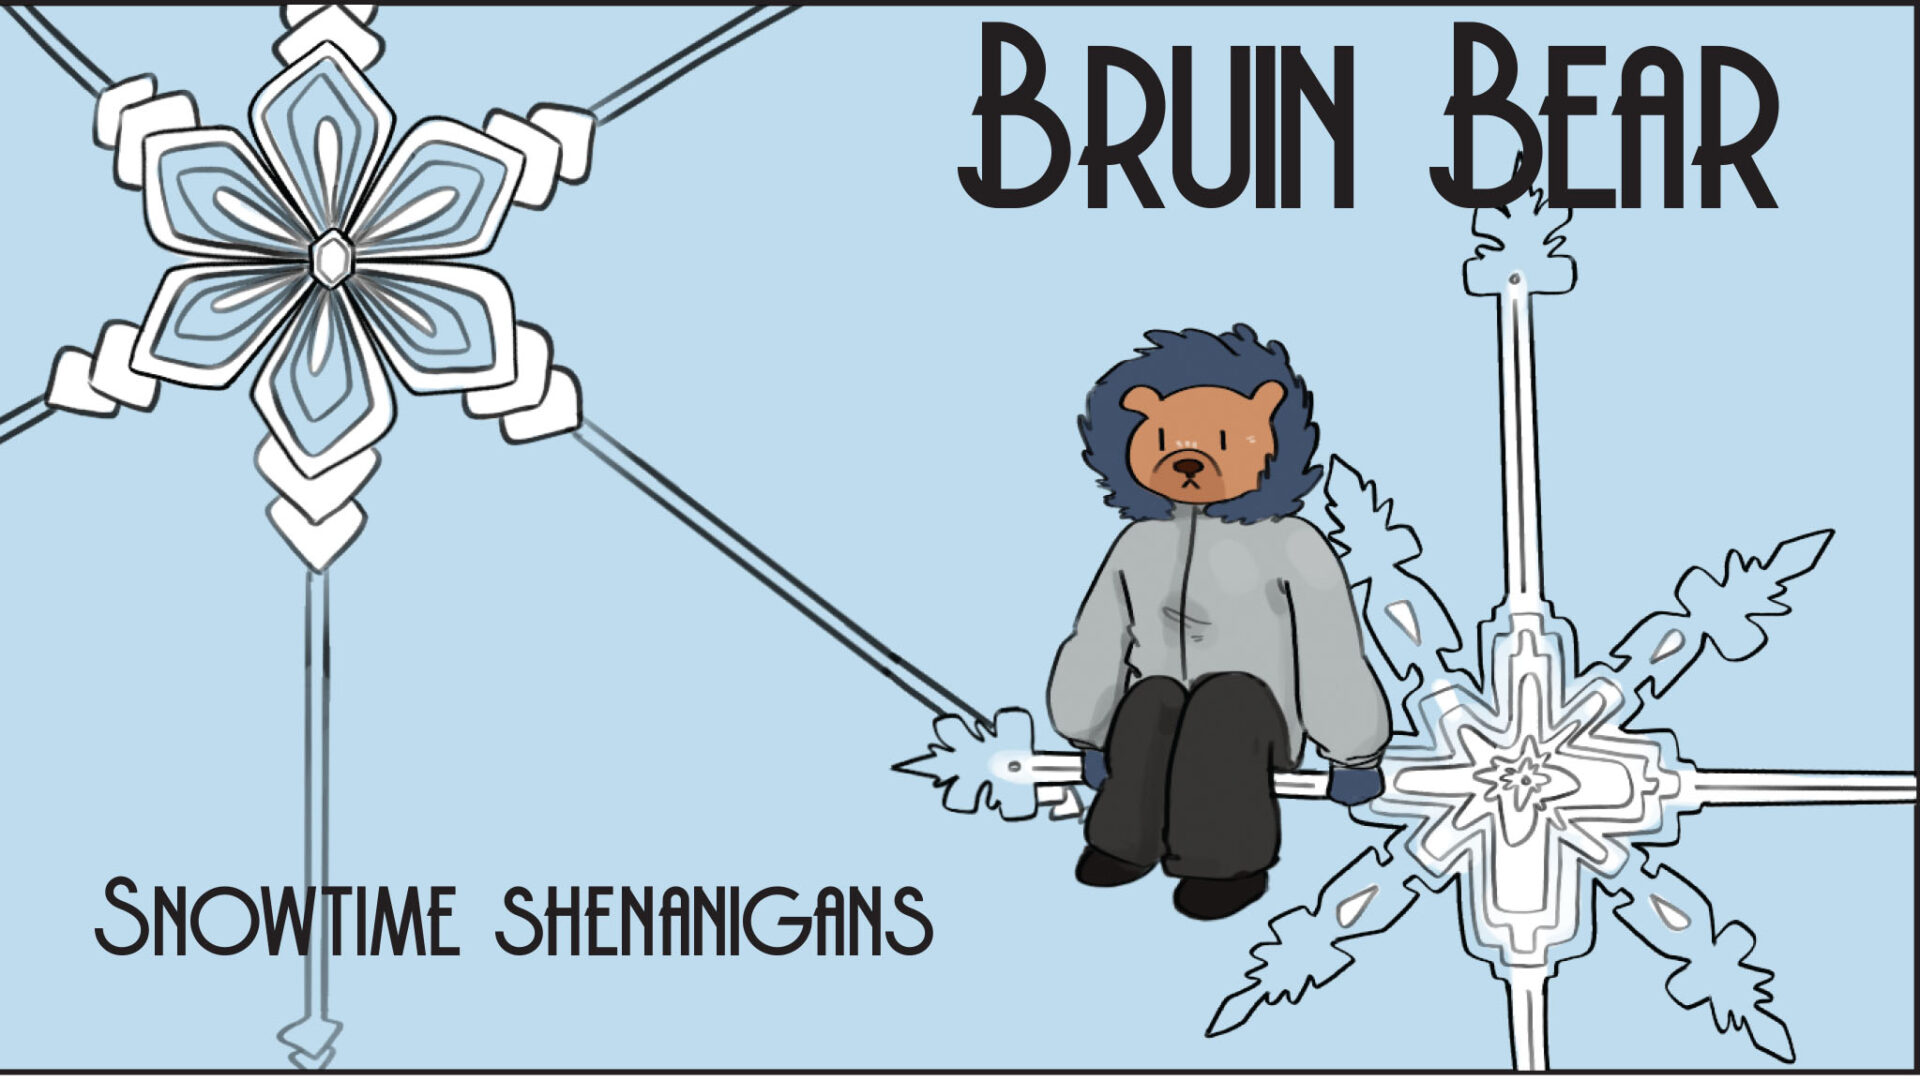 Bruin Bear's Snowtime Shenanigans